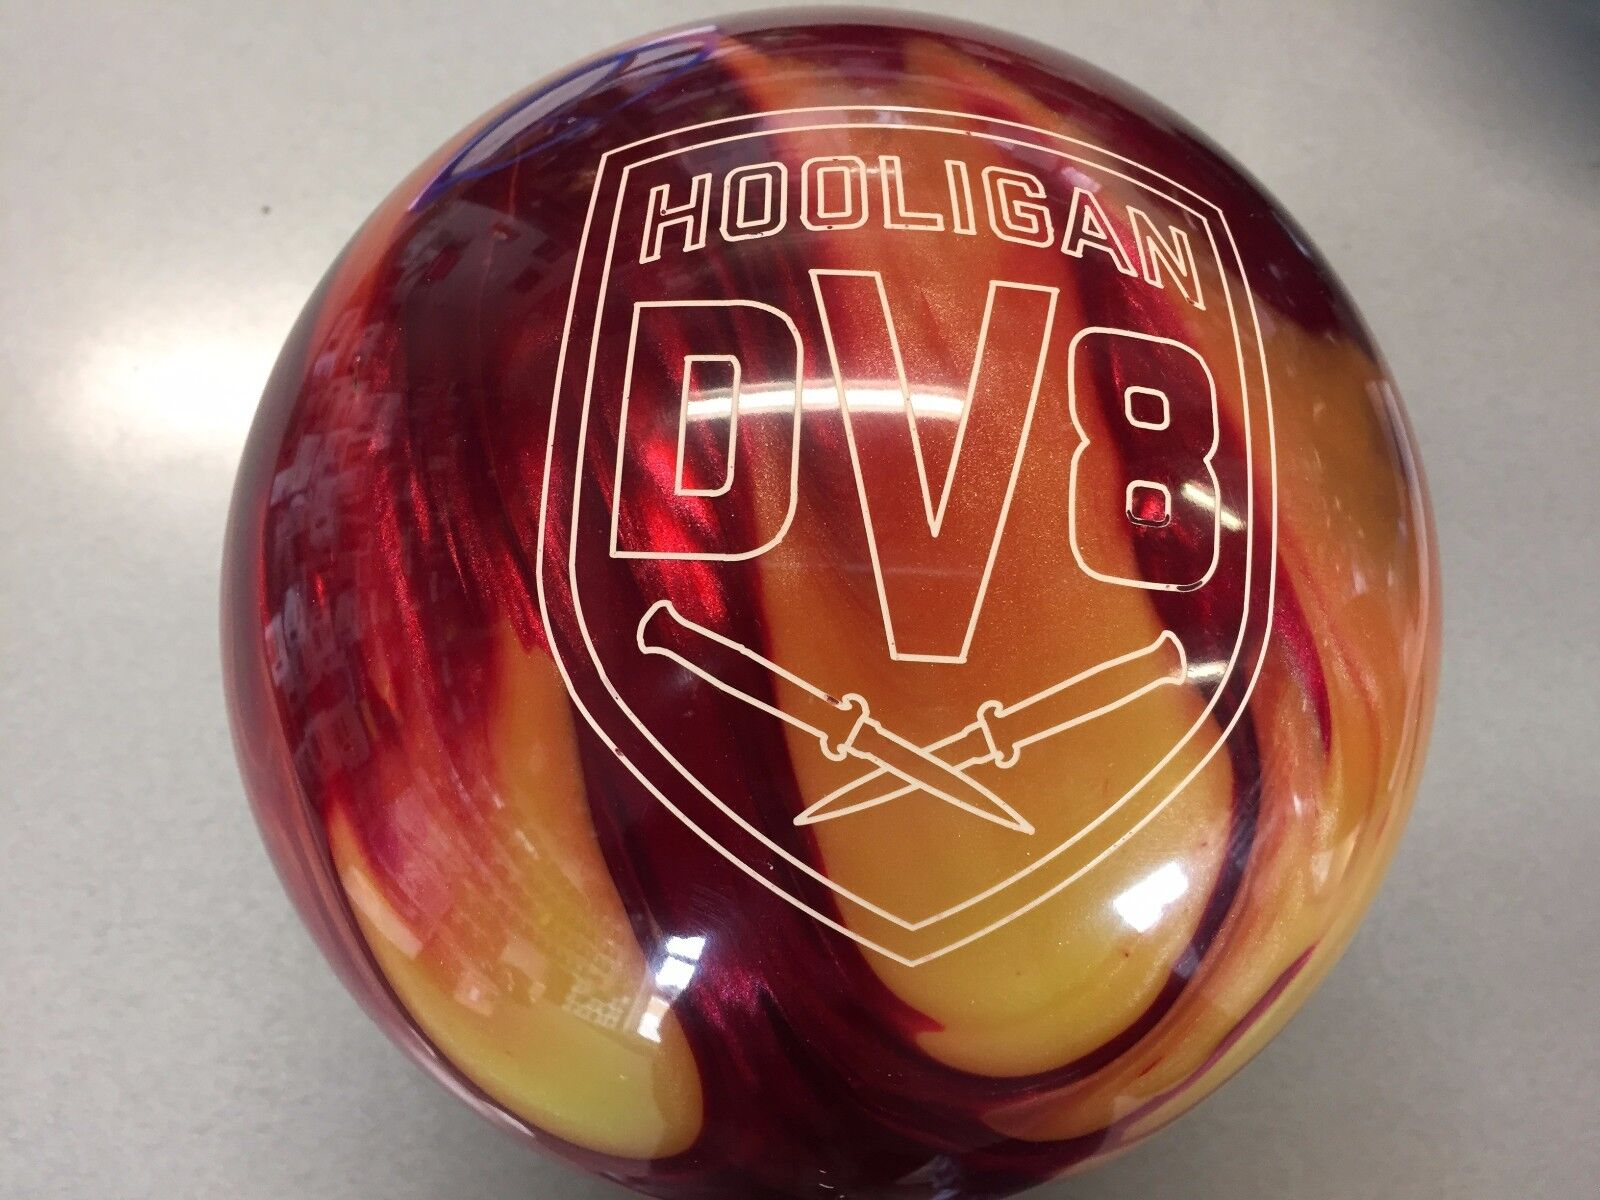 DV8 HOOLIGAN  BOWLING  ball  15 lb. 1ST QUAL.  BRAND NEW IN BOX